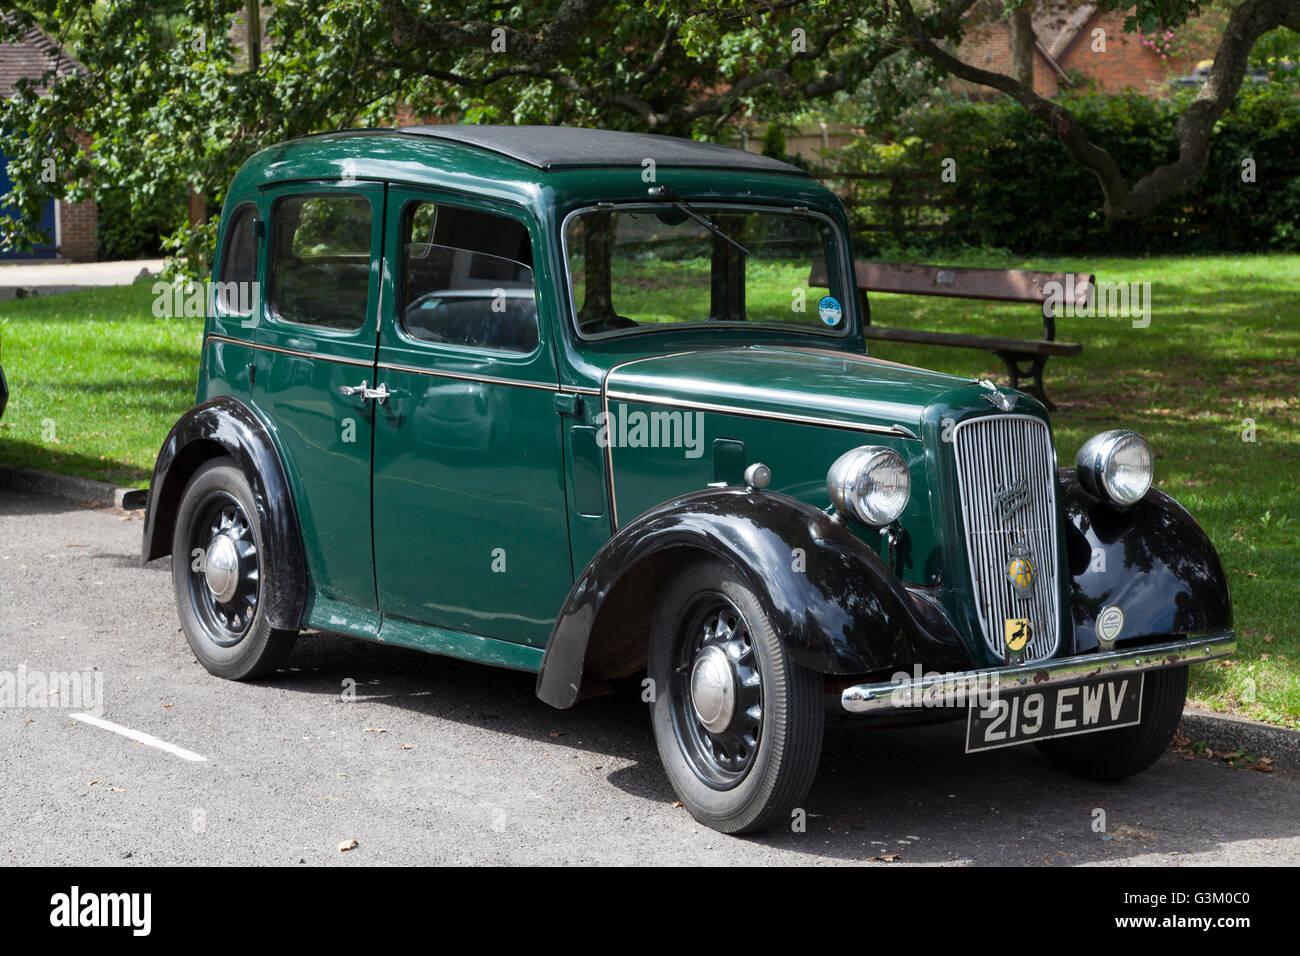 Green Austin Seven, old motor car, Romsey, Hampshire, England, United Kingdom, Europe - Stock Image